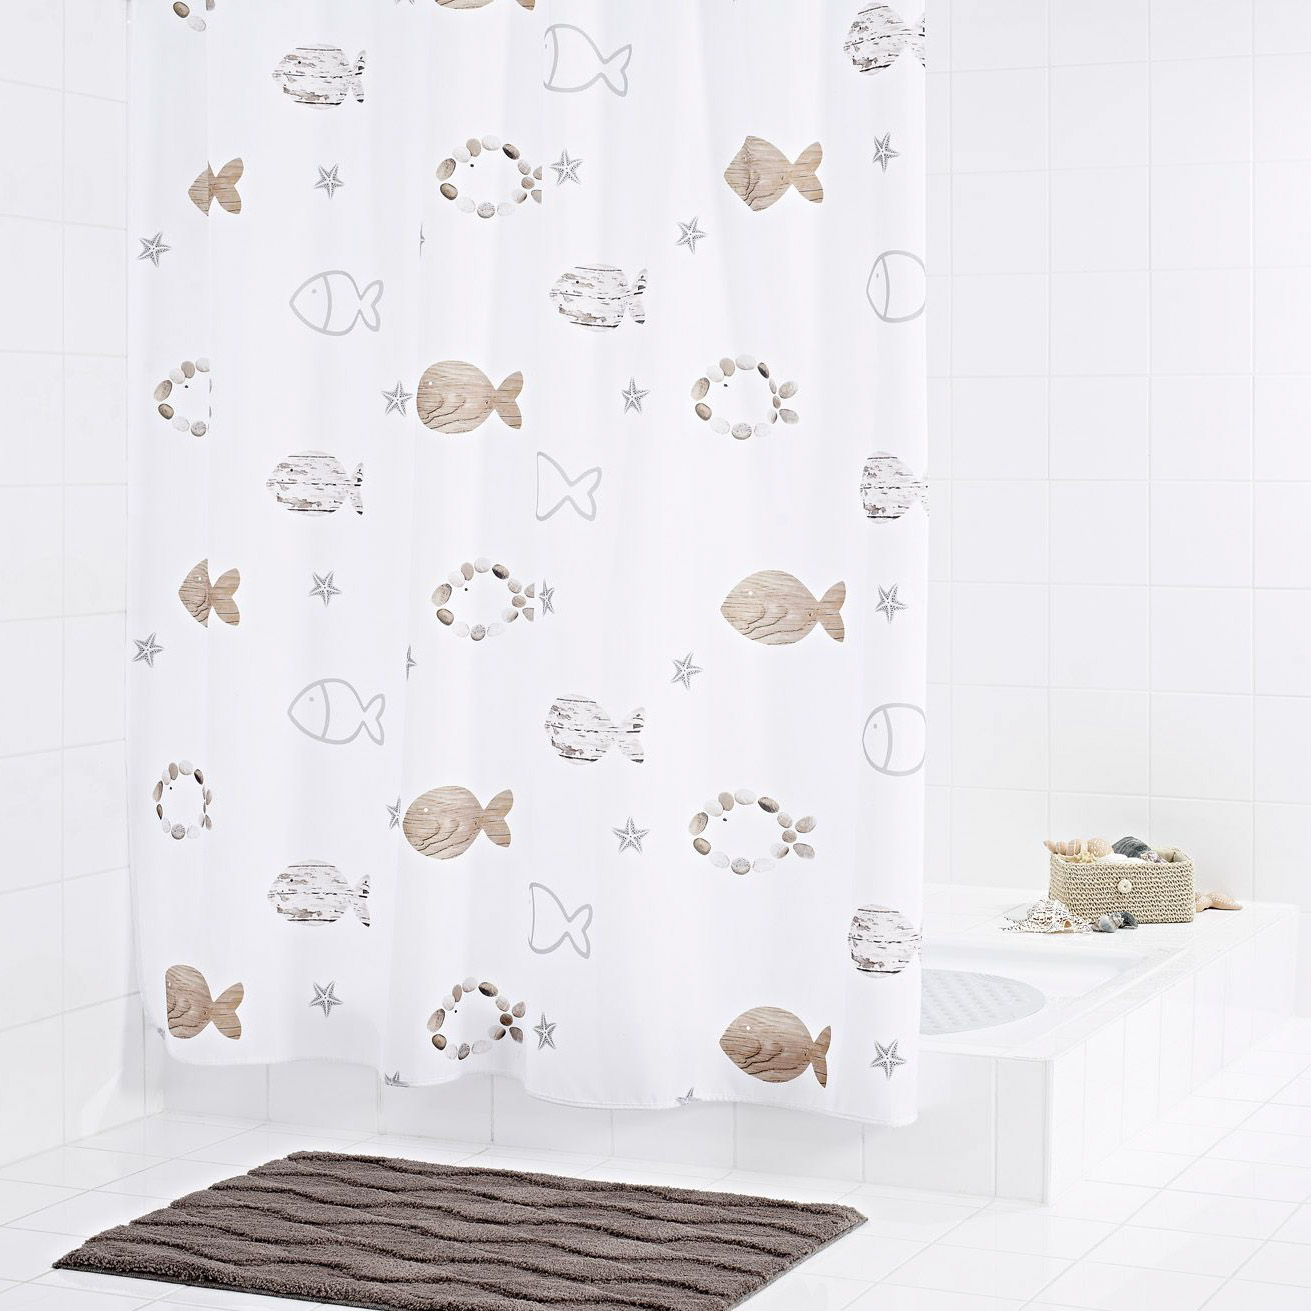 Штора для ванных комнат Fishes бежевый/коричневый 180*200 Ridder для ванных комнат